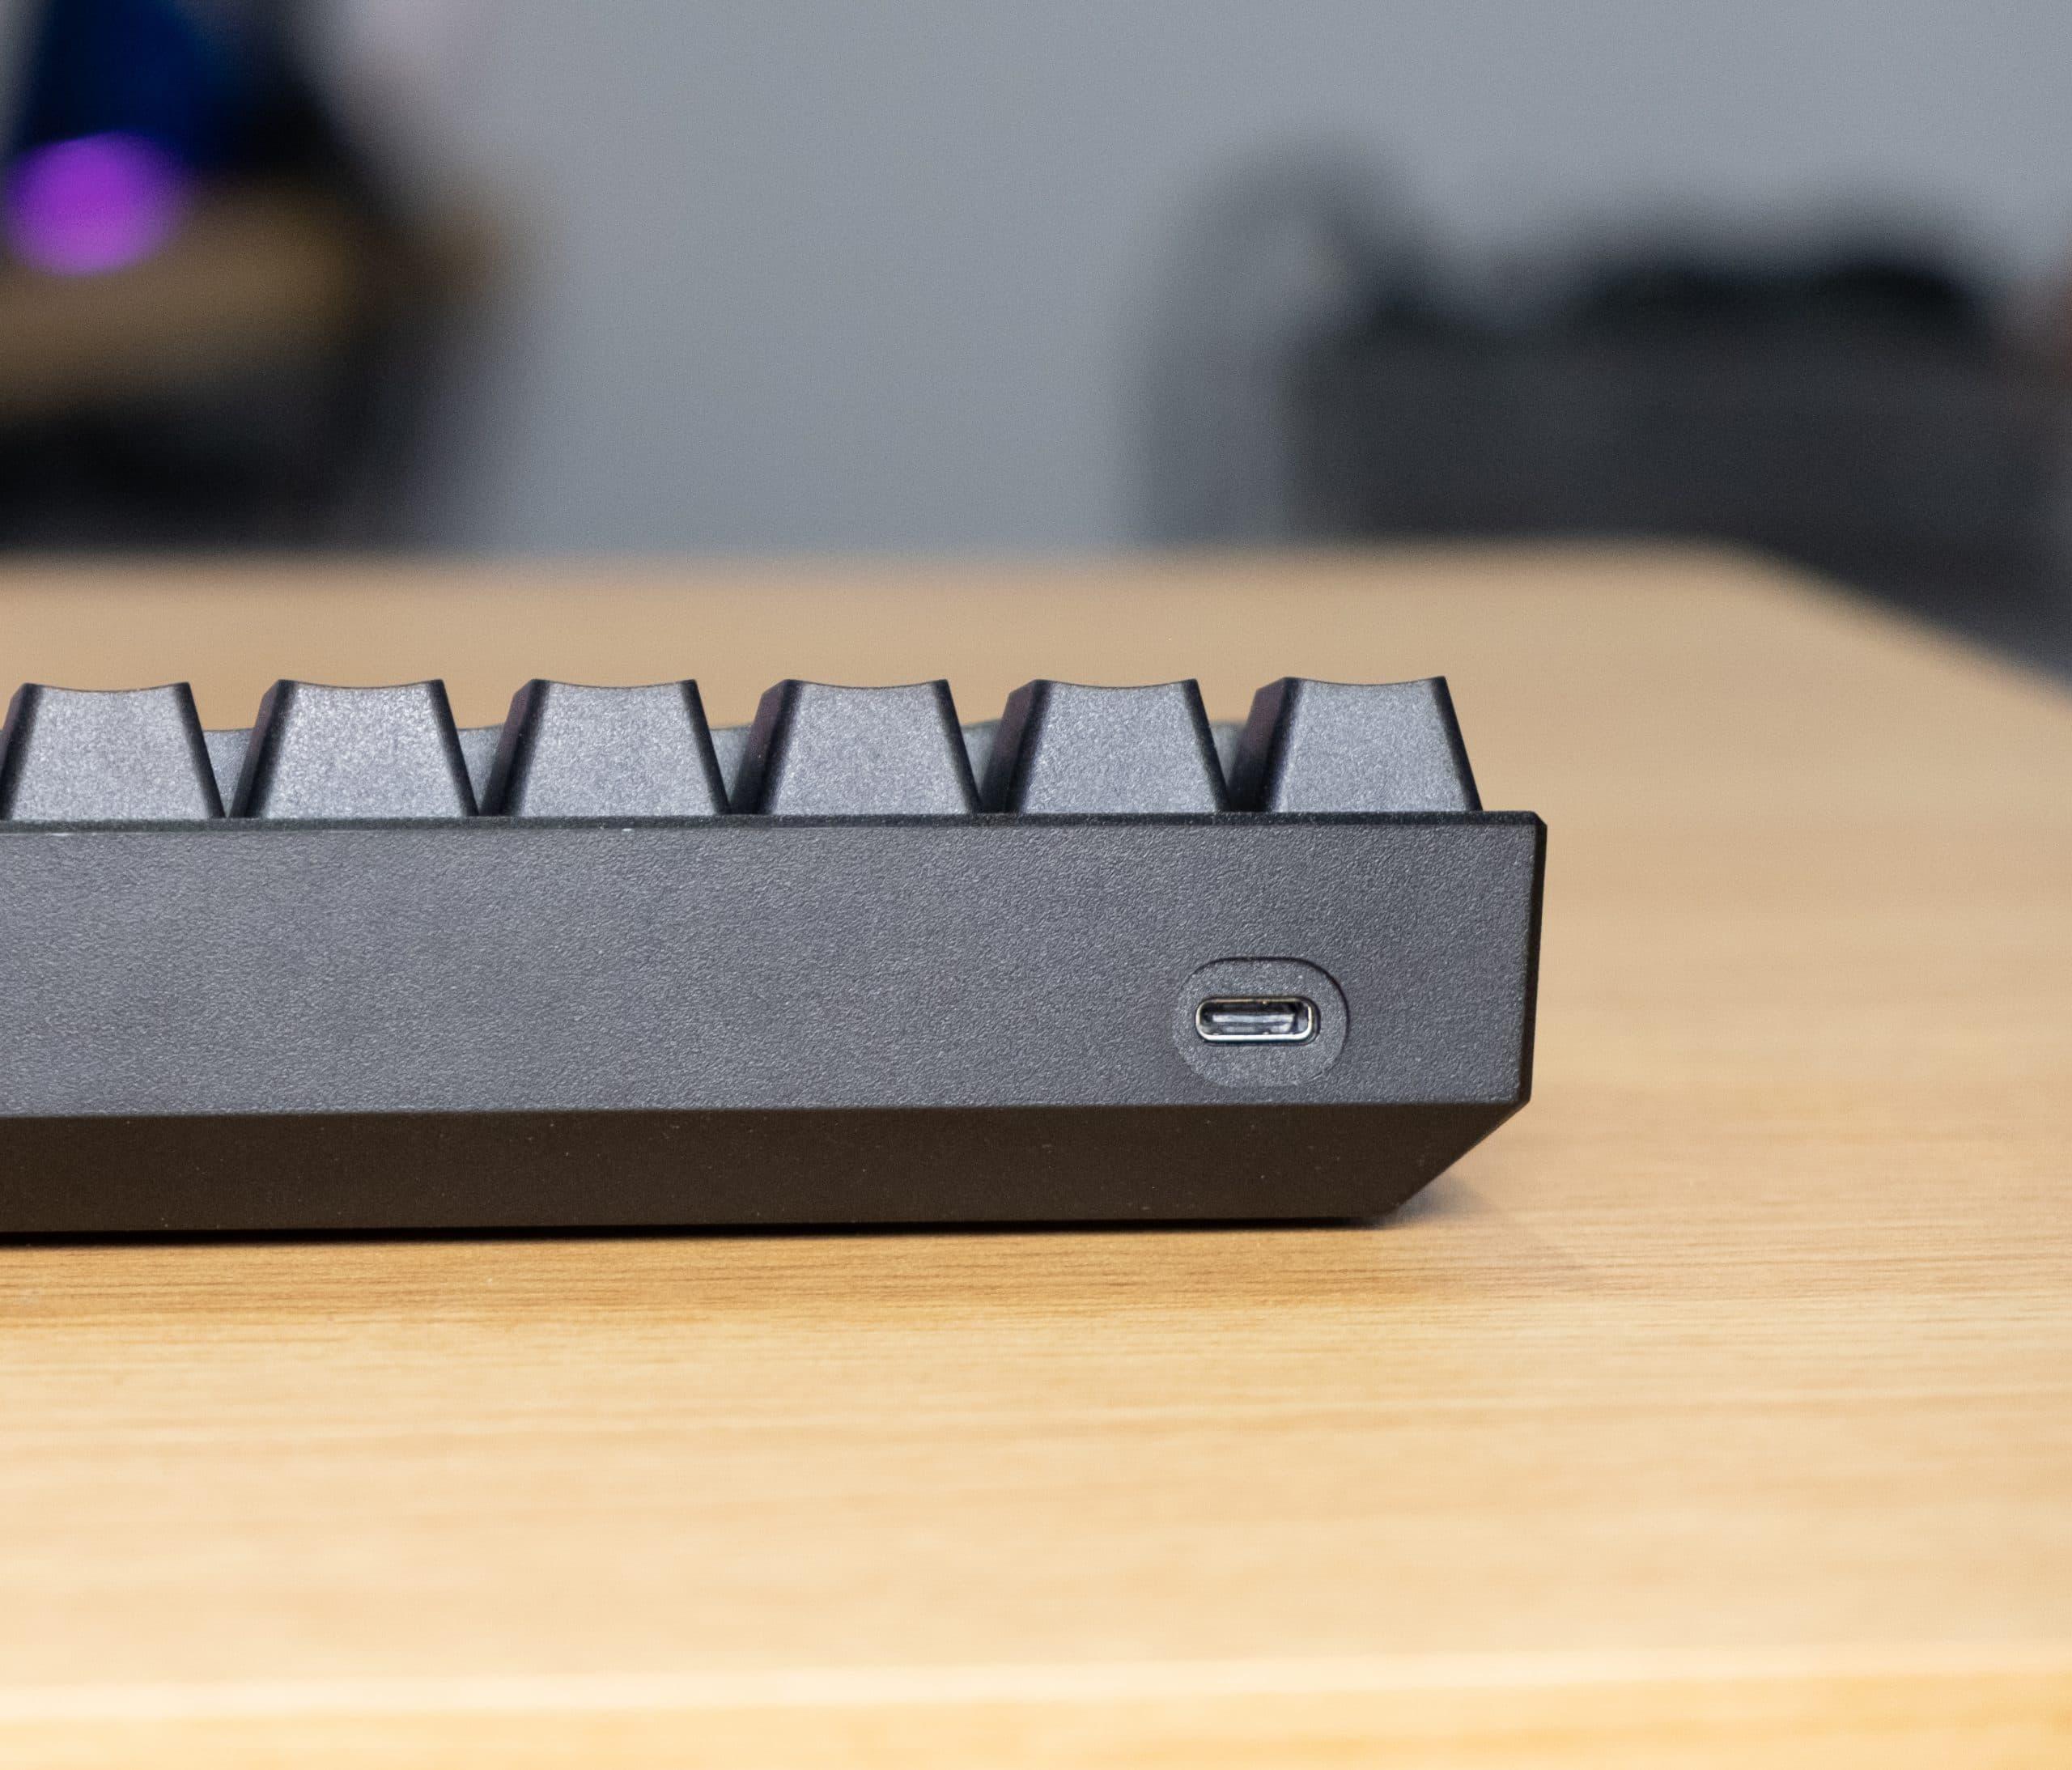 Anne Pro 2 - USB C Port